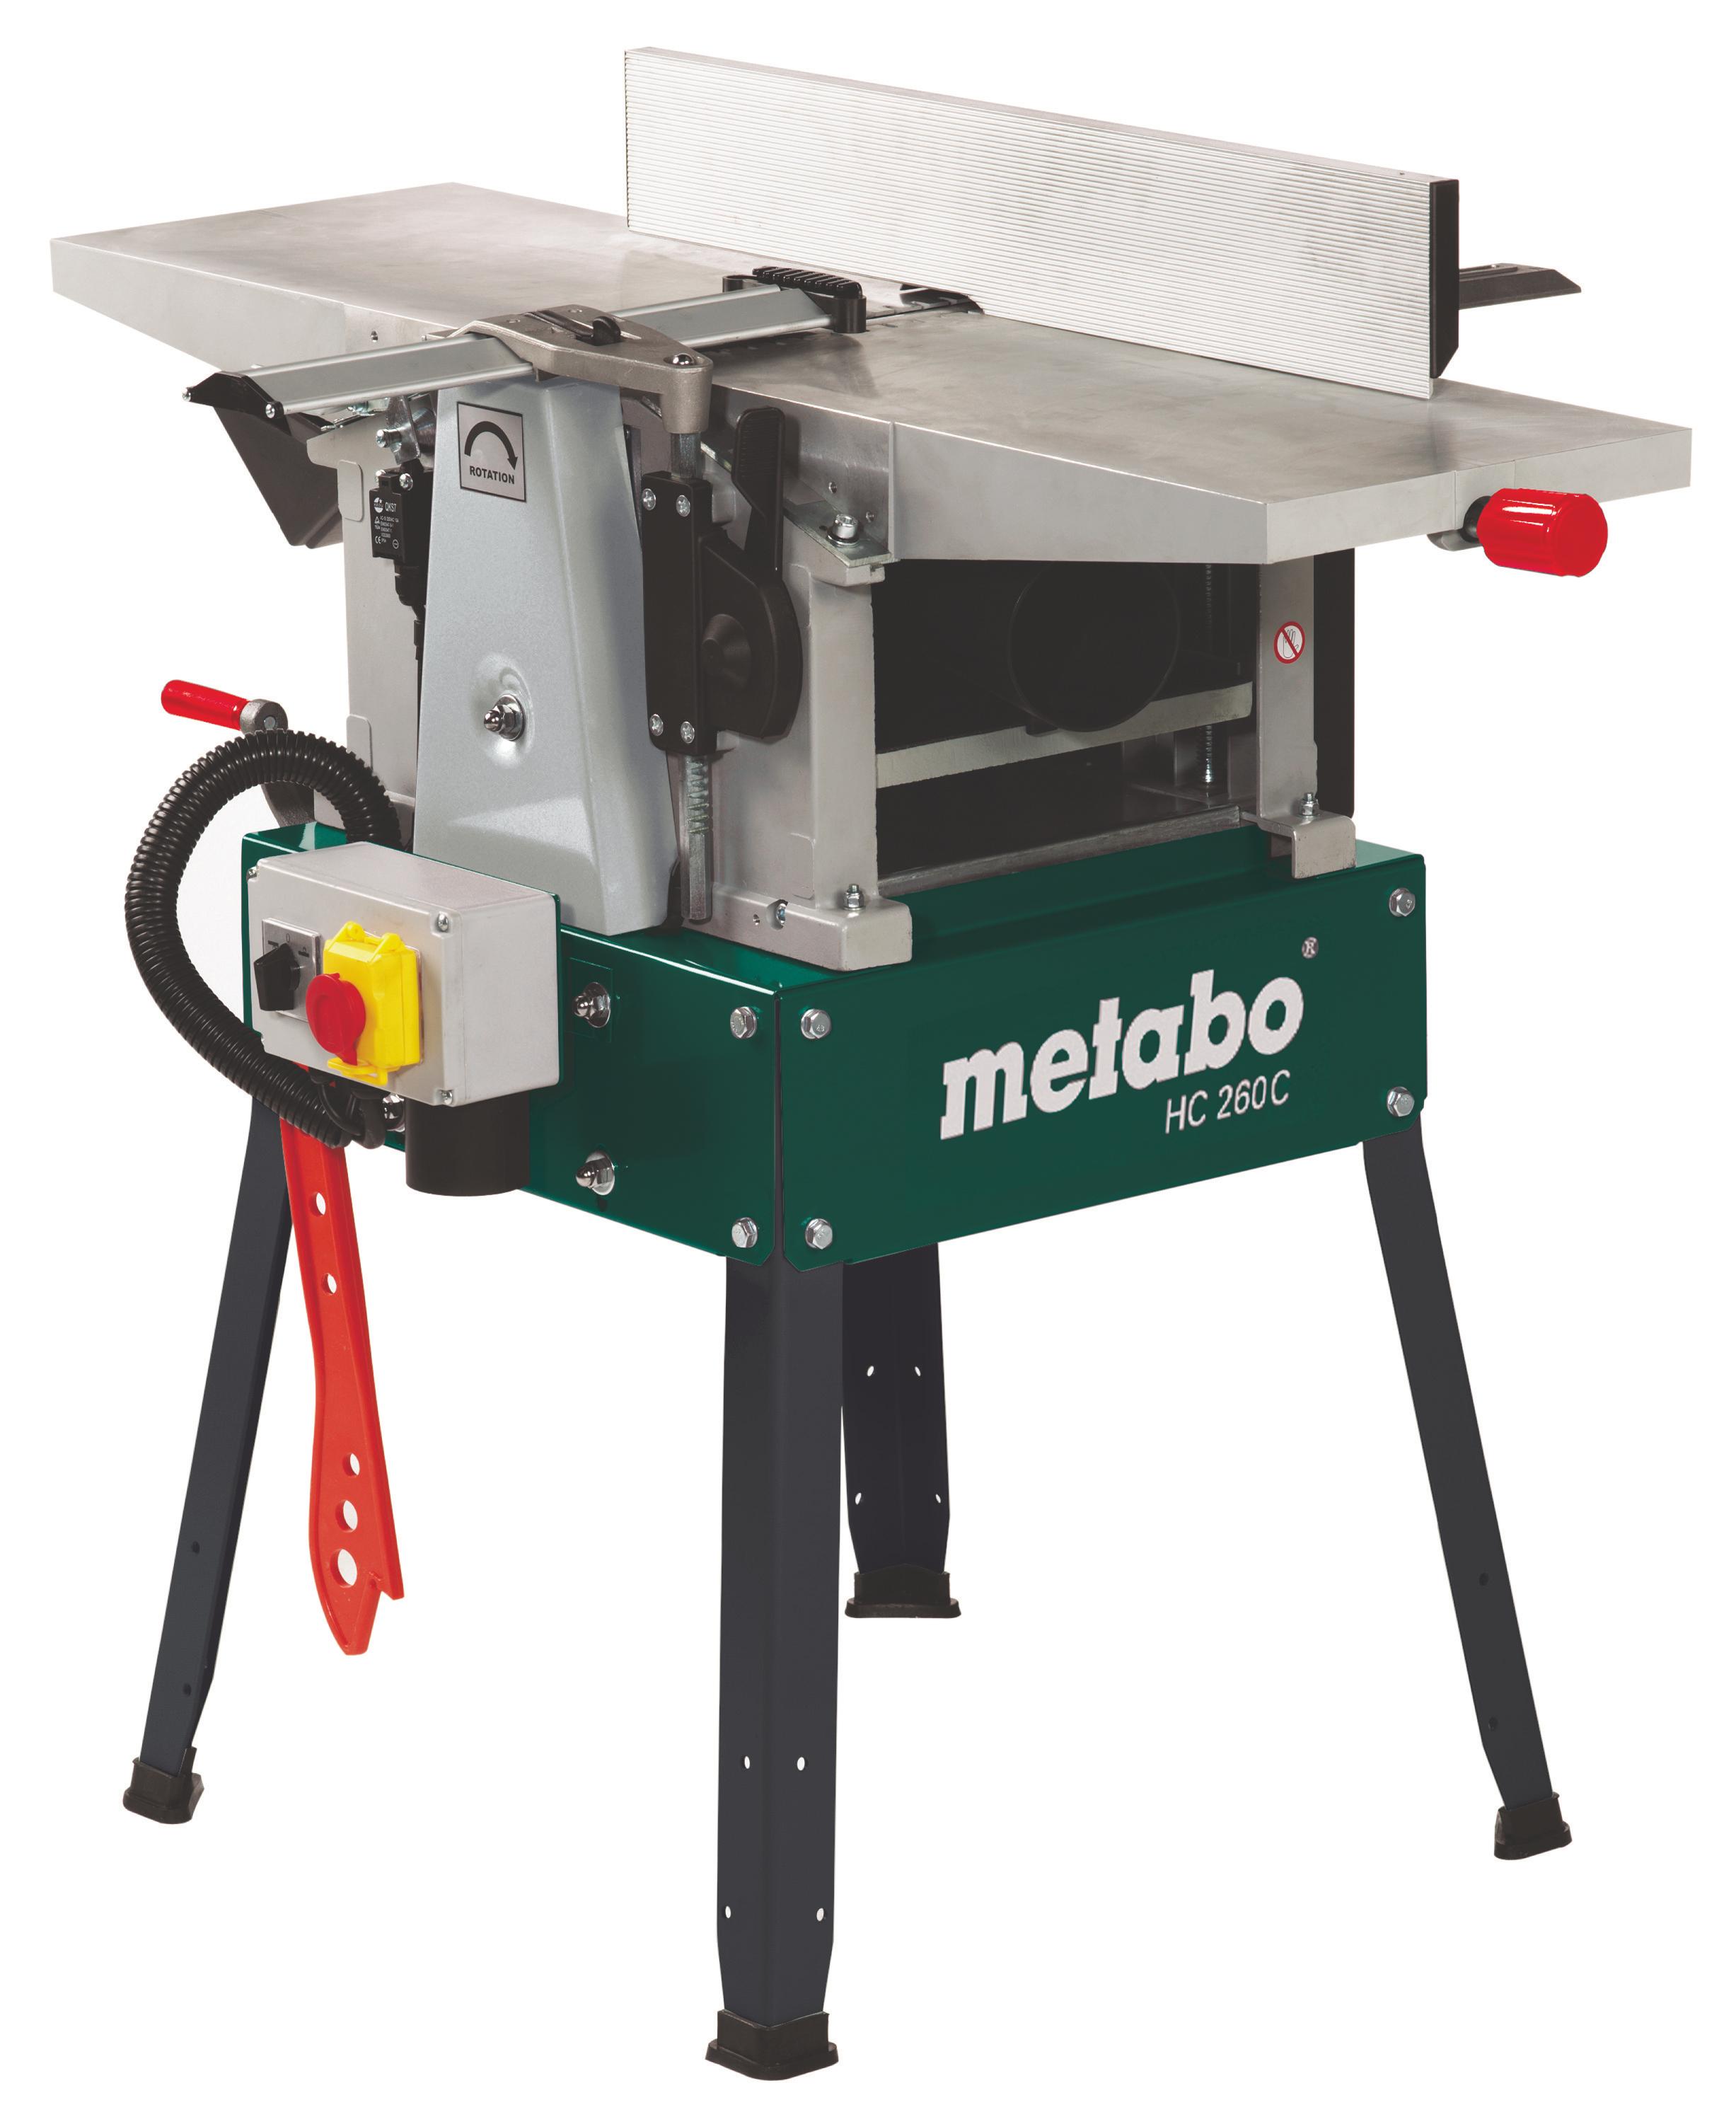 ������ ����������-����������� Metabo Hc 260 c - 2,2 wnb